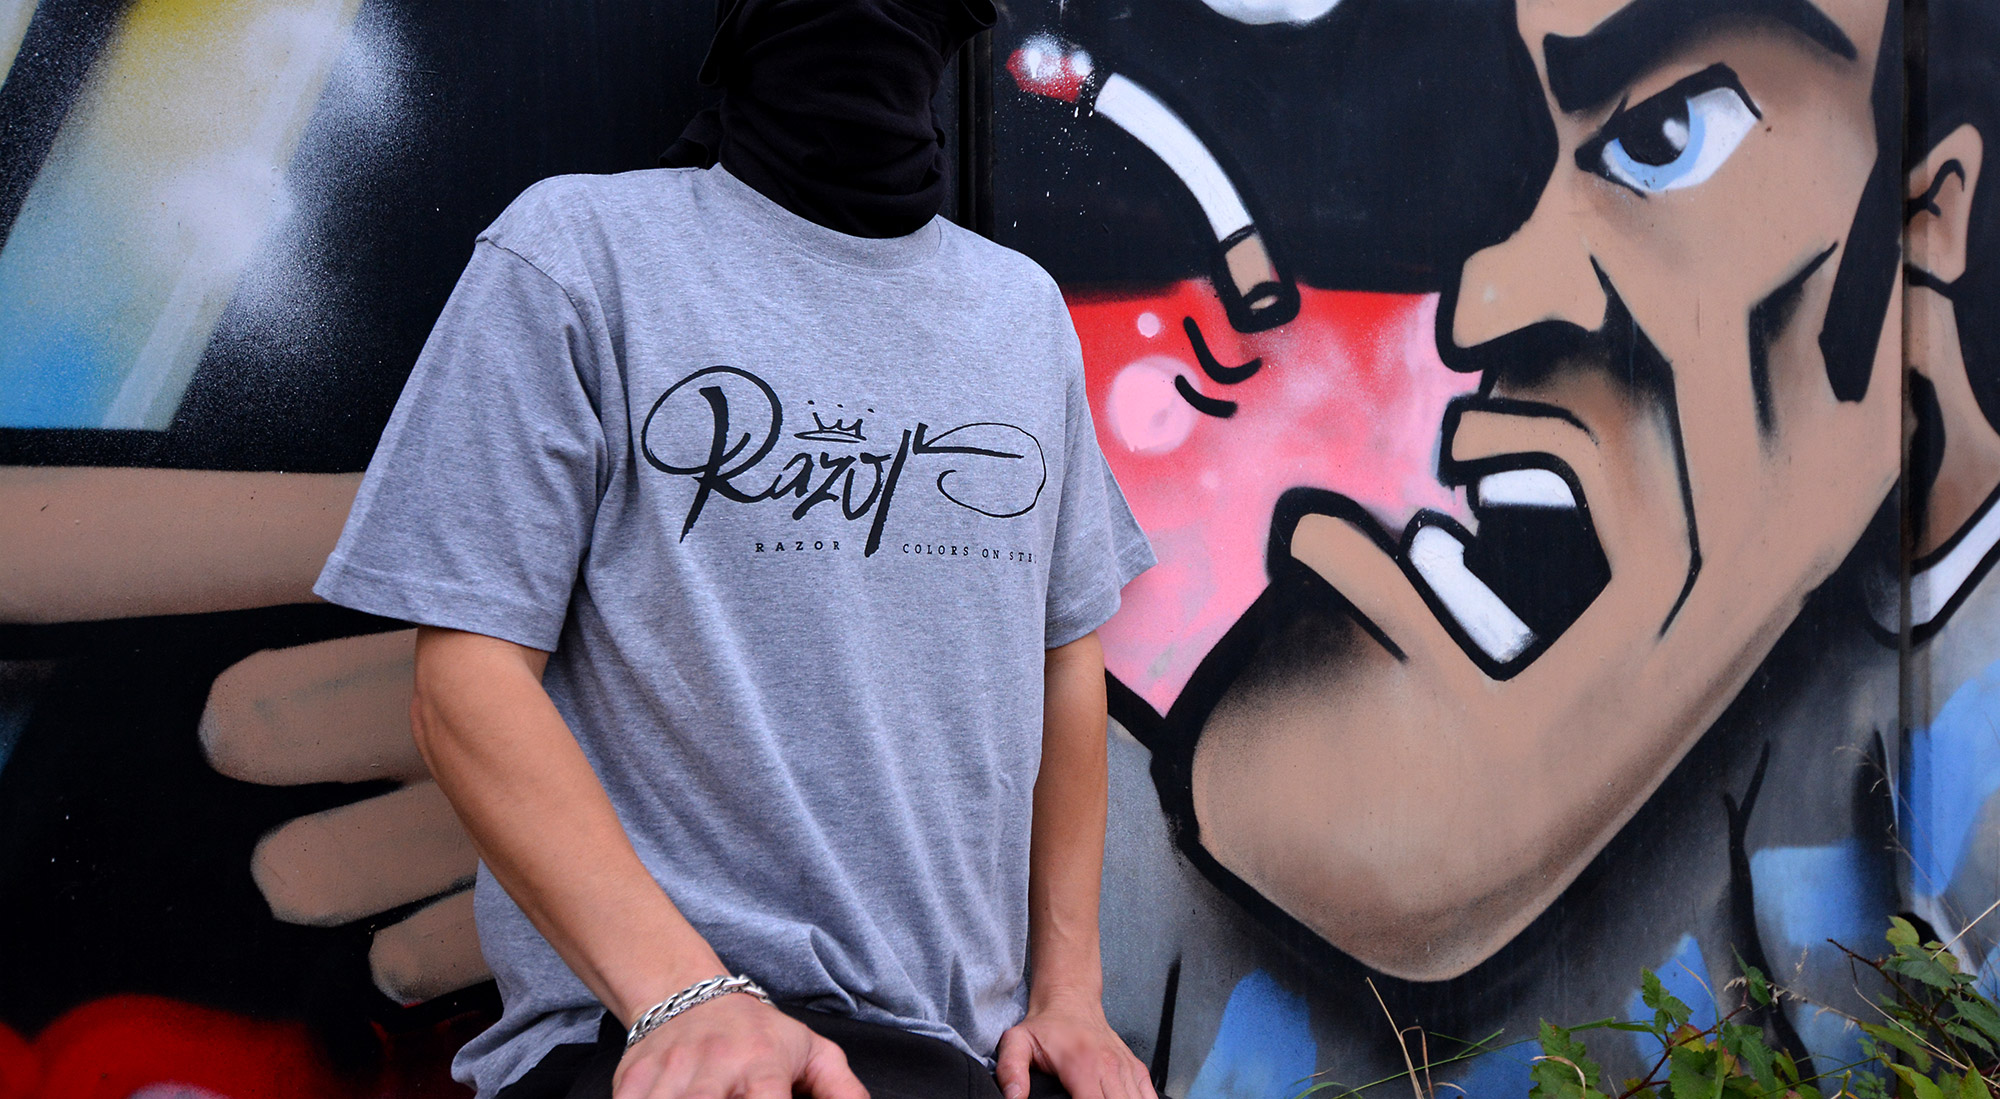 RAZOR-T-Shirt-Grey-Teaser-s